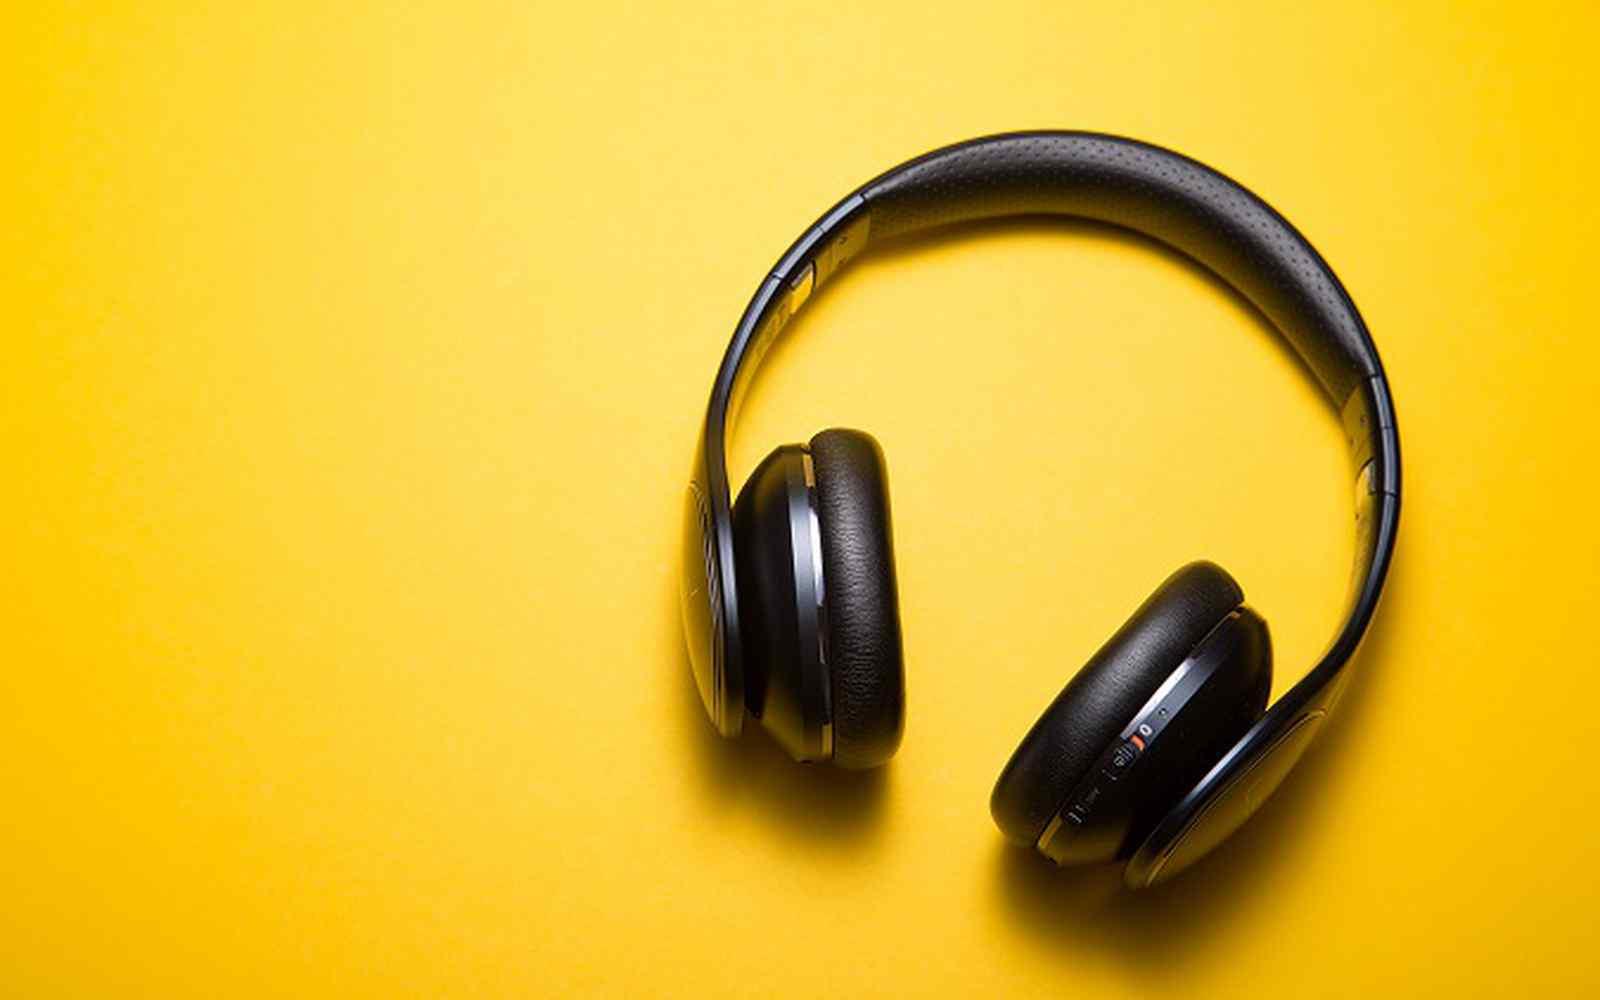 Black music headphones with yellow background